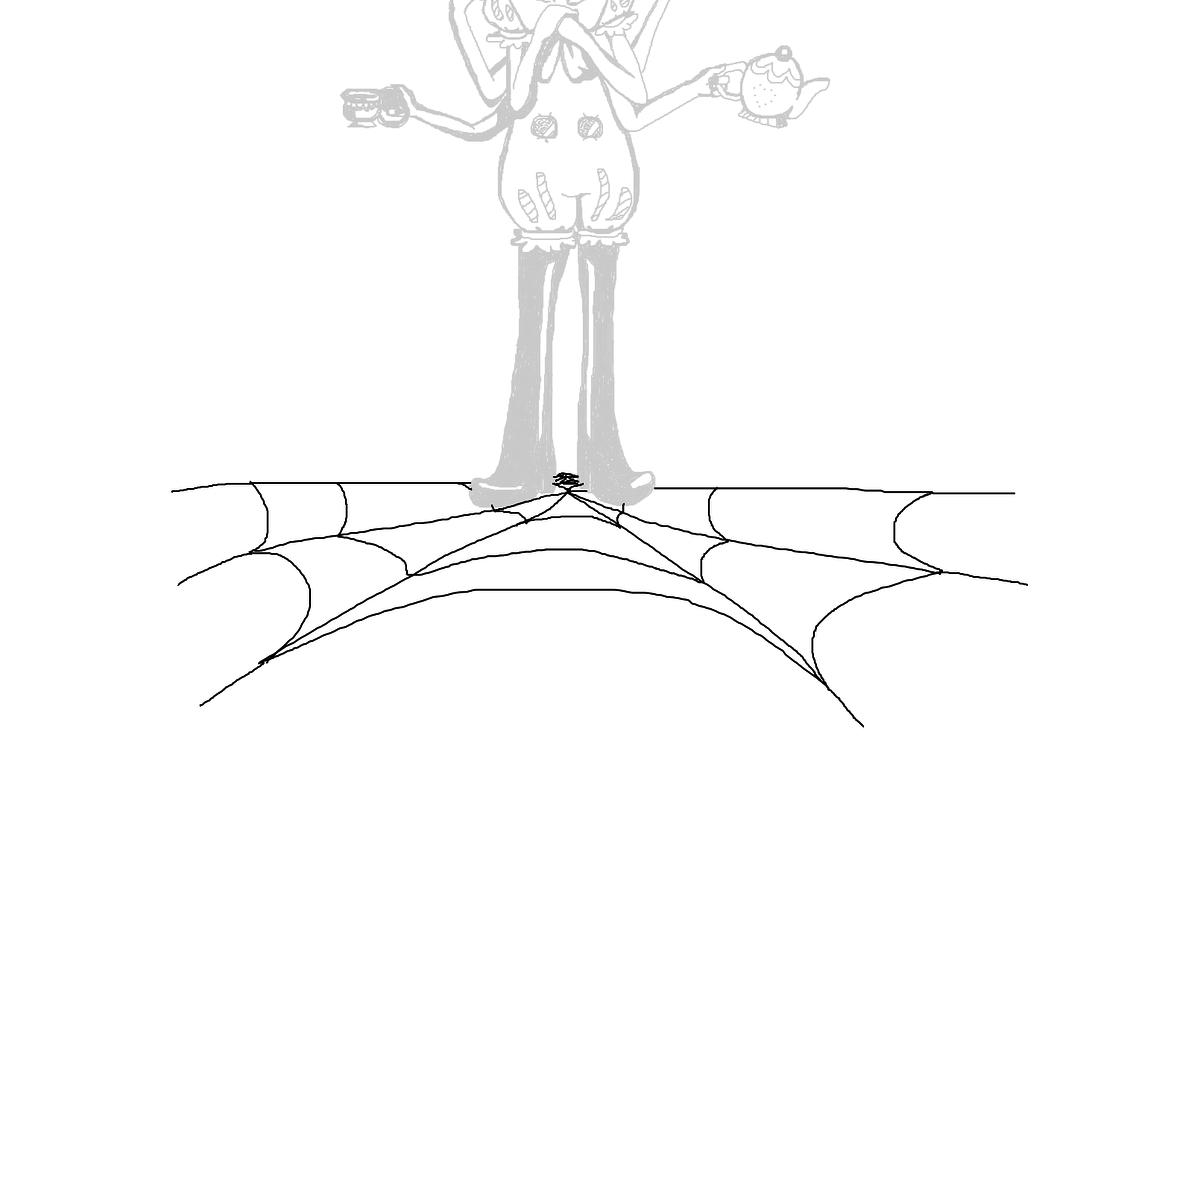 BAAAM drawing#23671 lat:41.0459136962890600lng: -79.6111145019531200